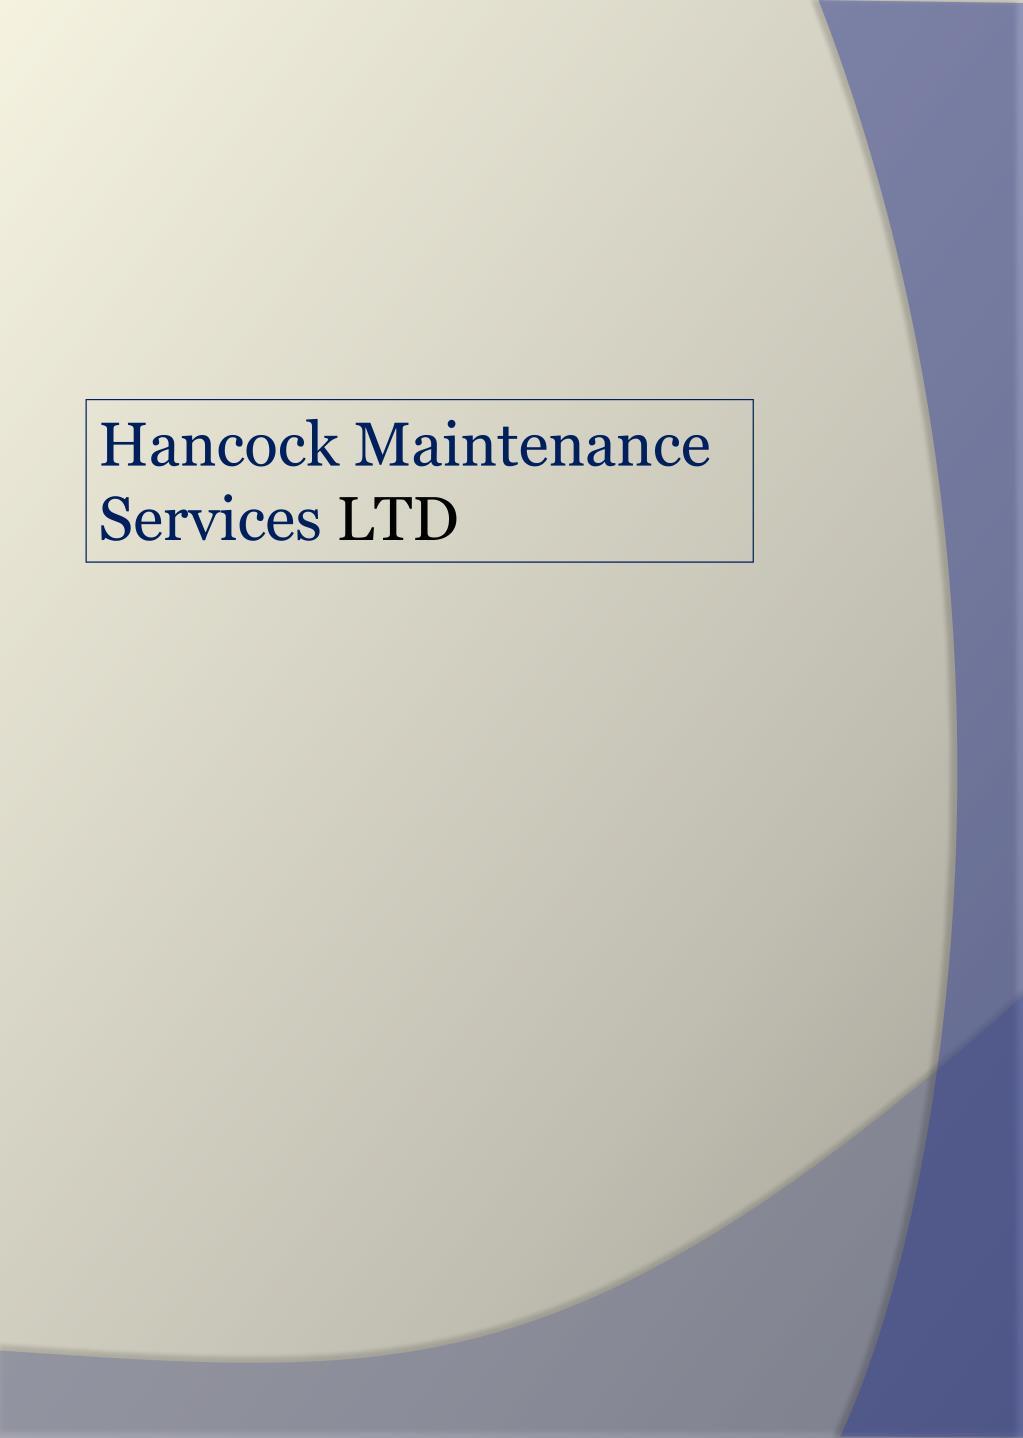 Hancock Maintenance Services